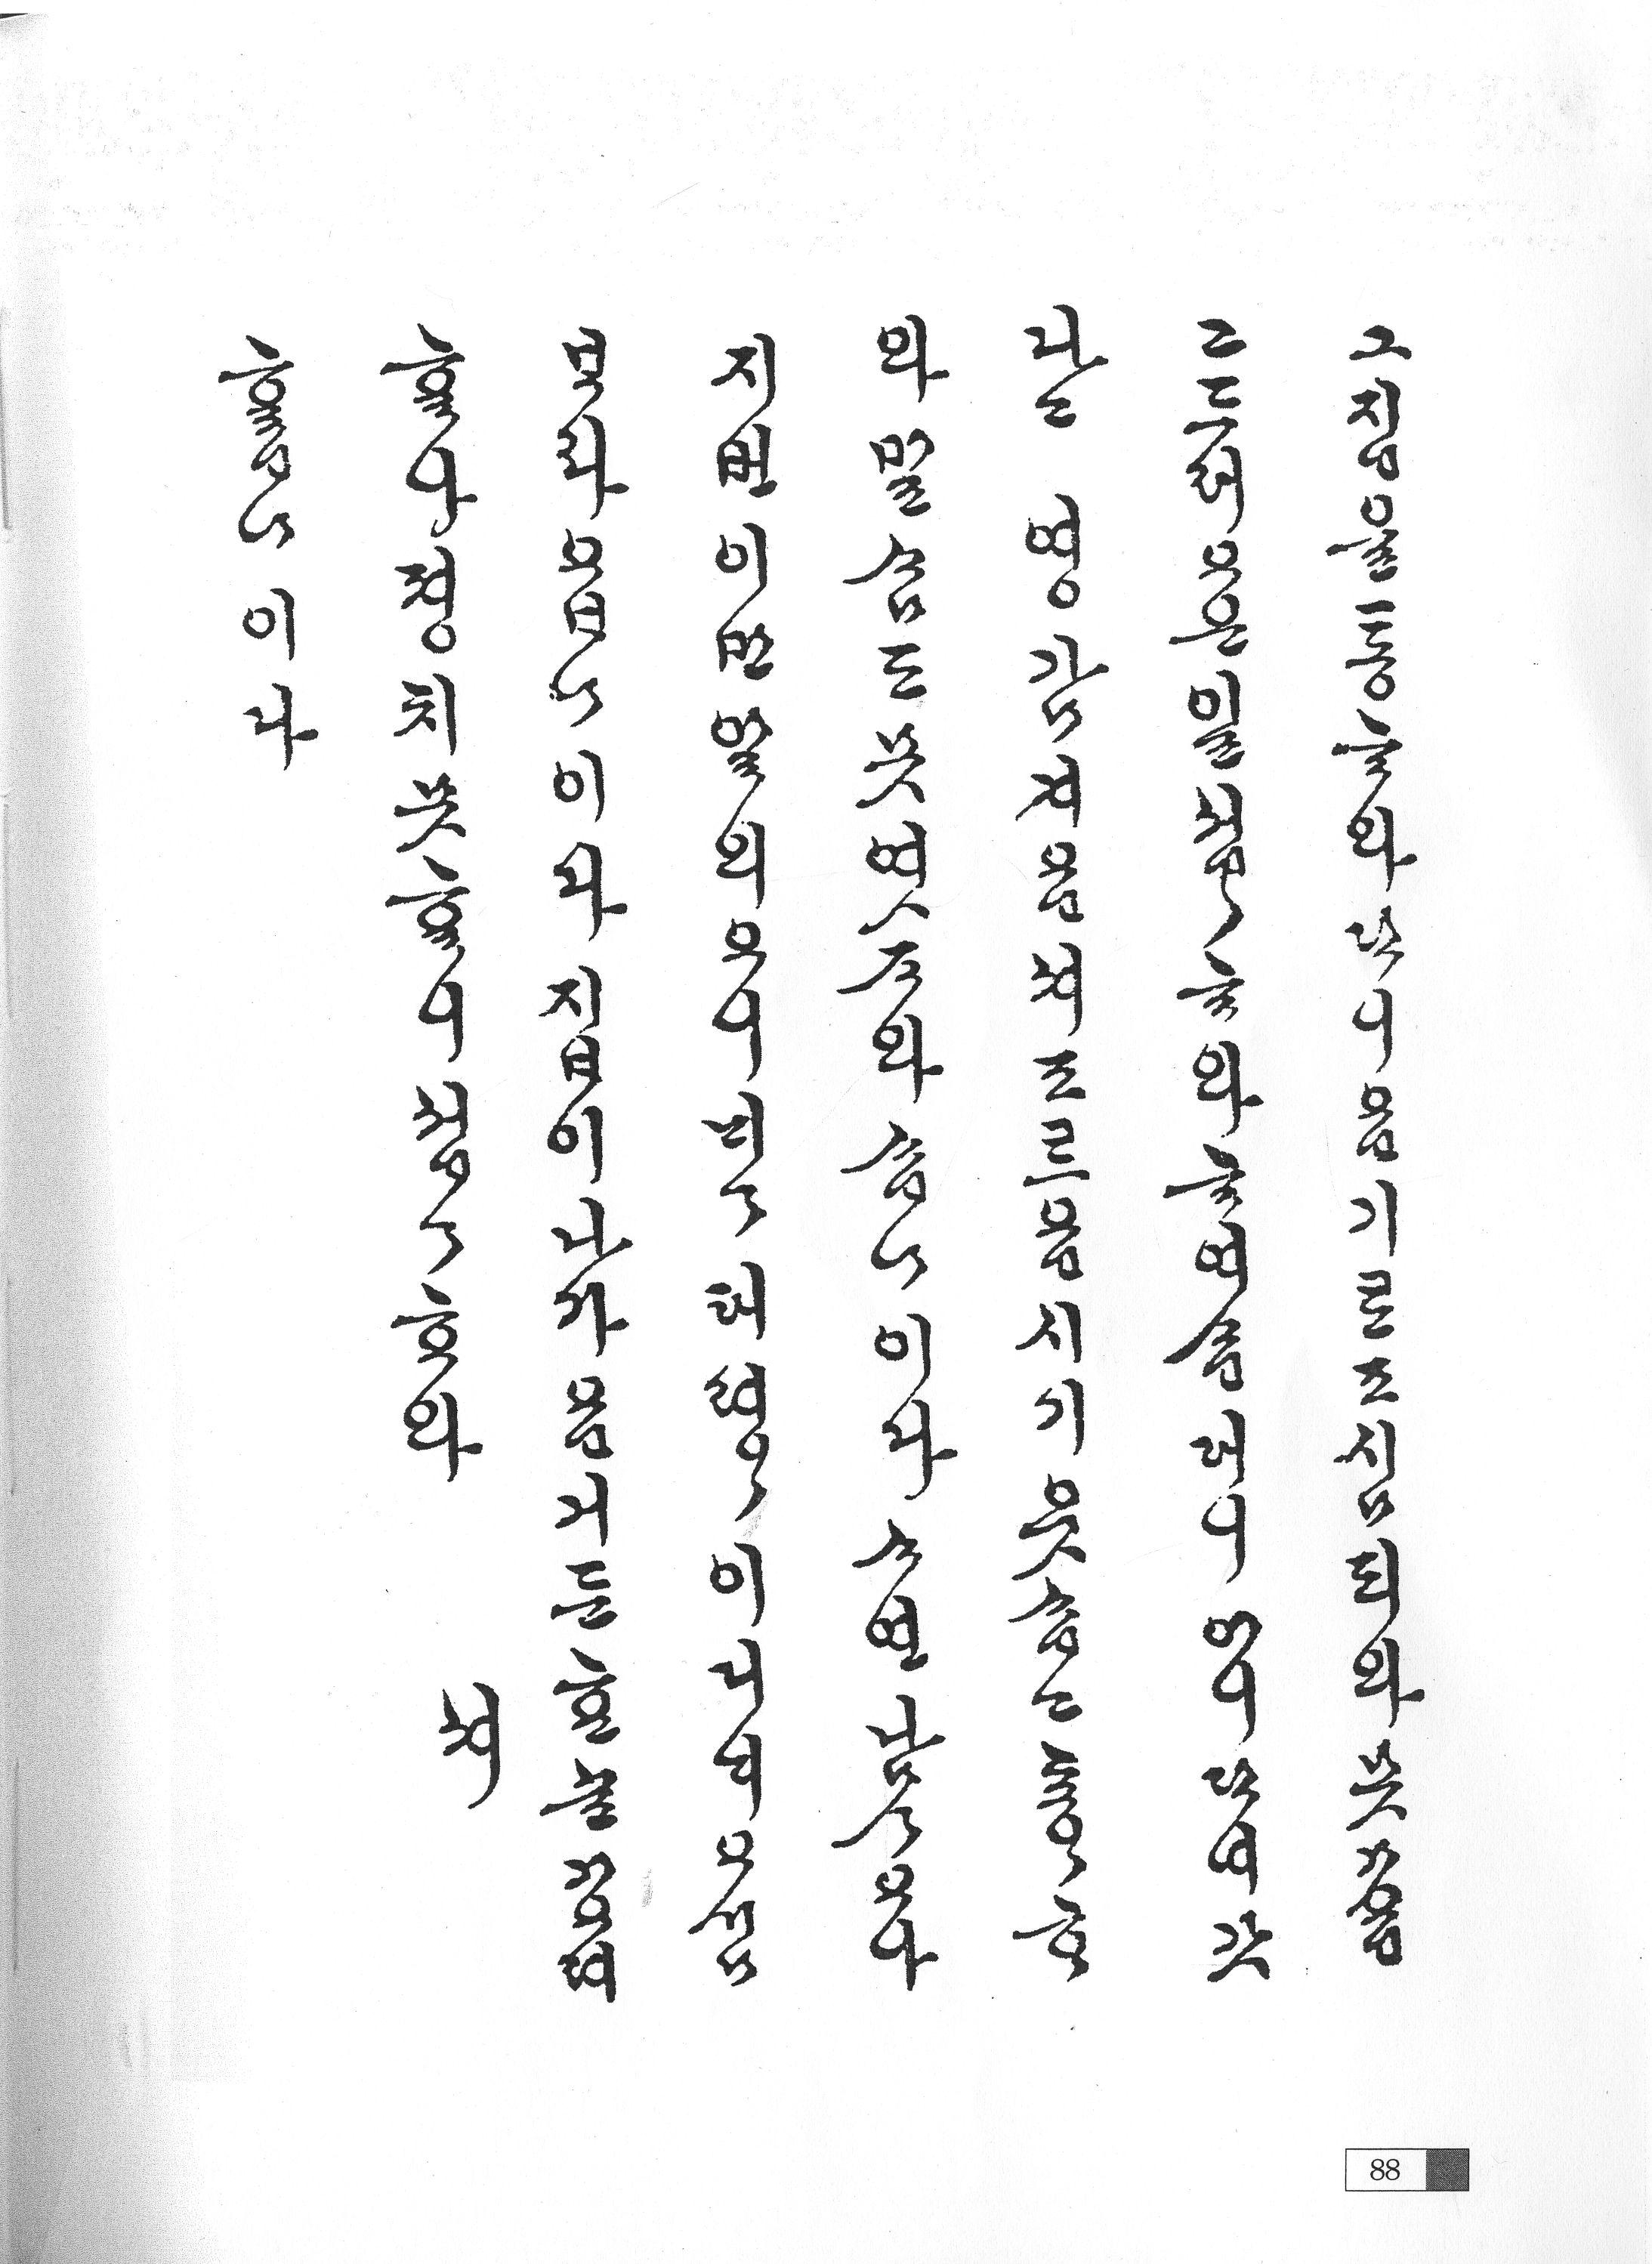 t116B_r1_윤다원_03/ 출처: 정사기람, 백경자, 신명숙, 오명순 외 2명 저